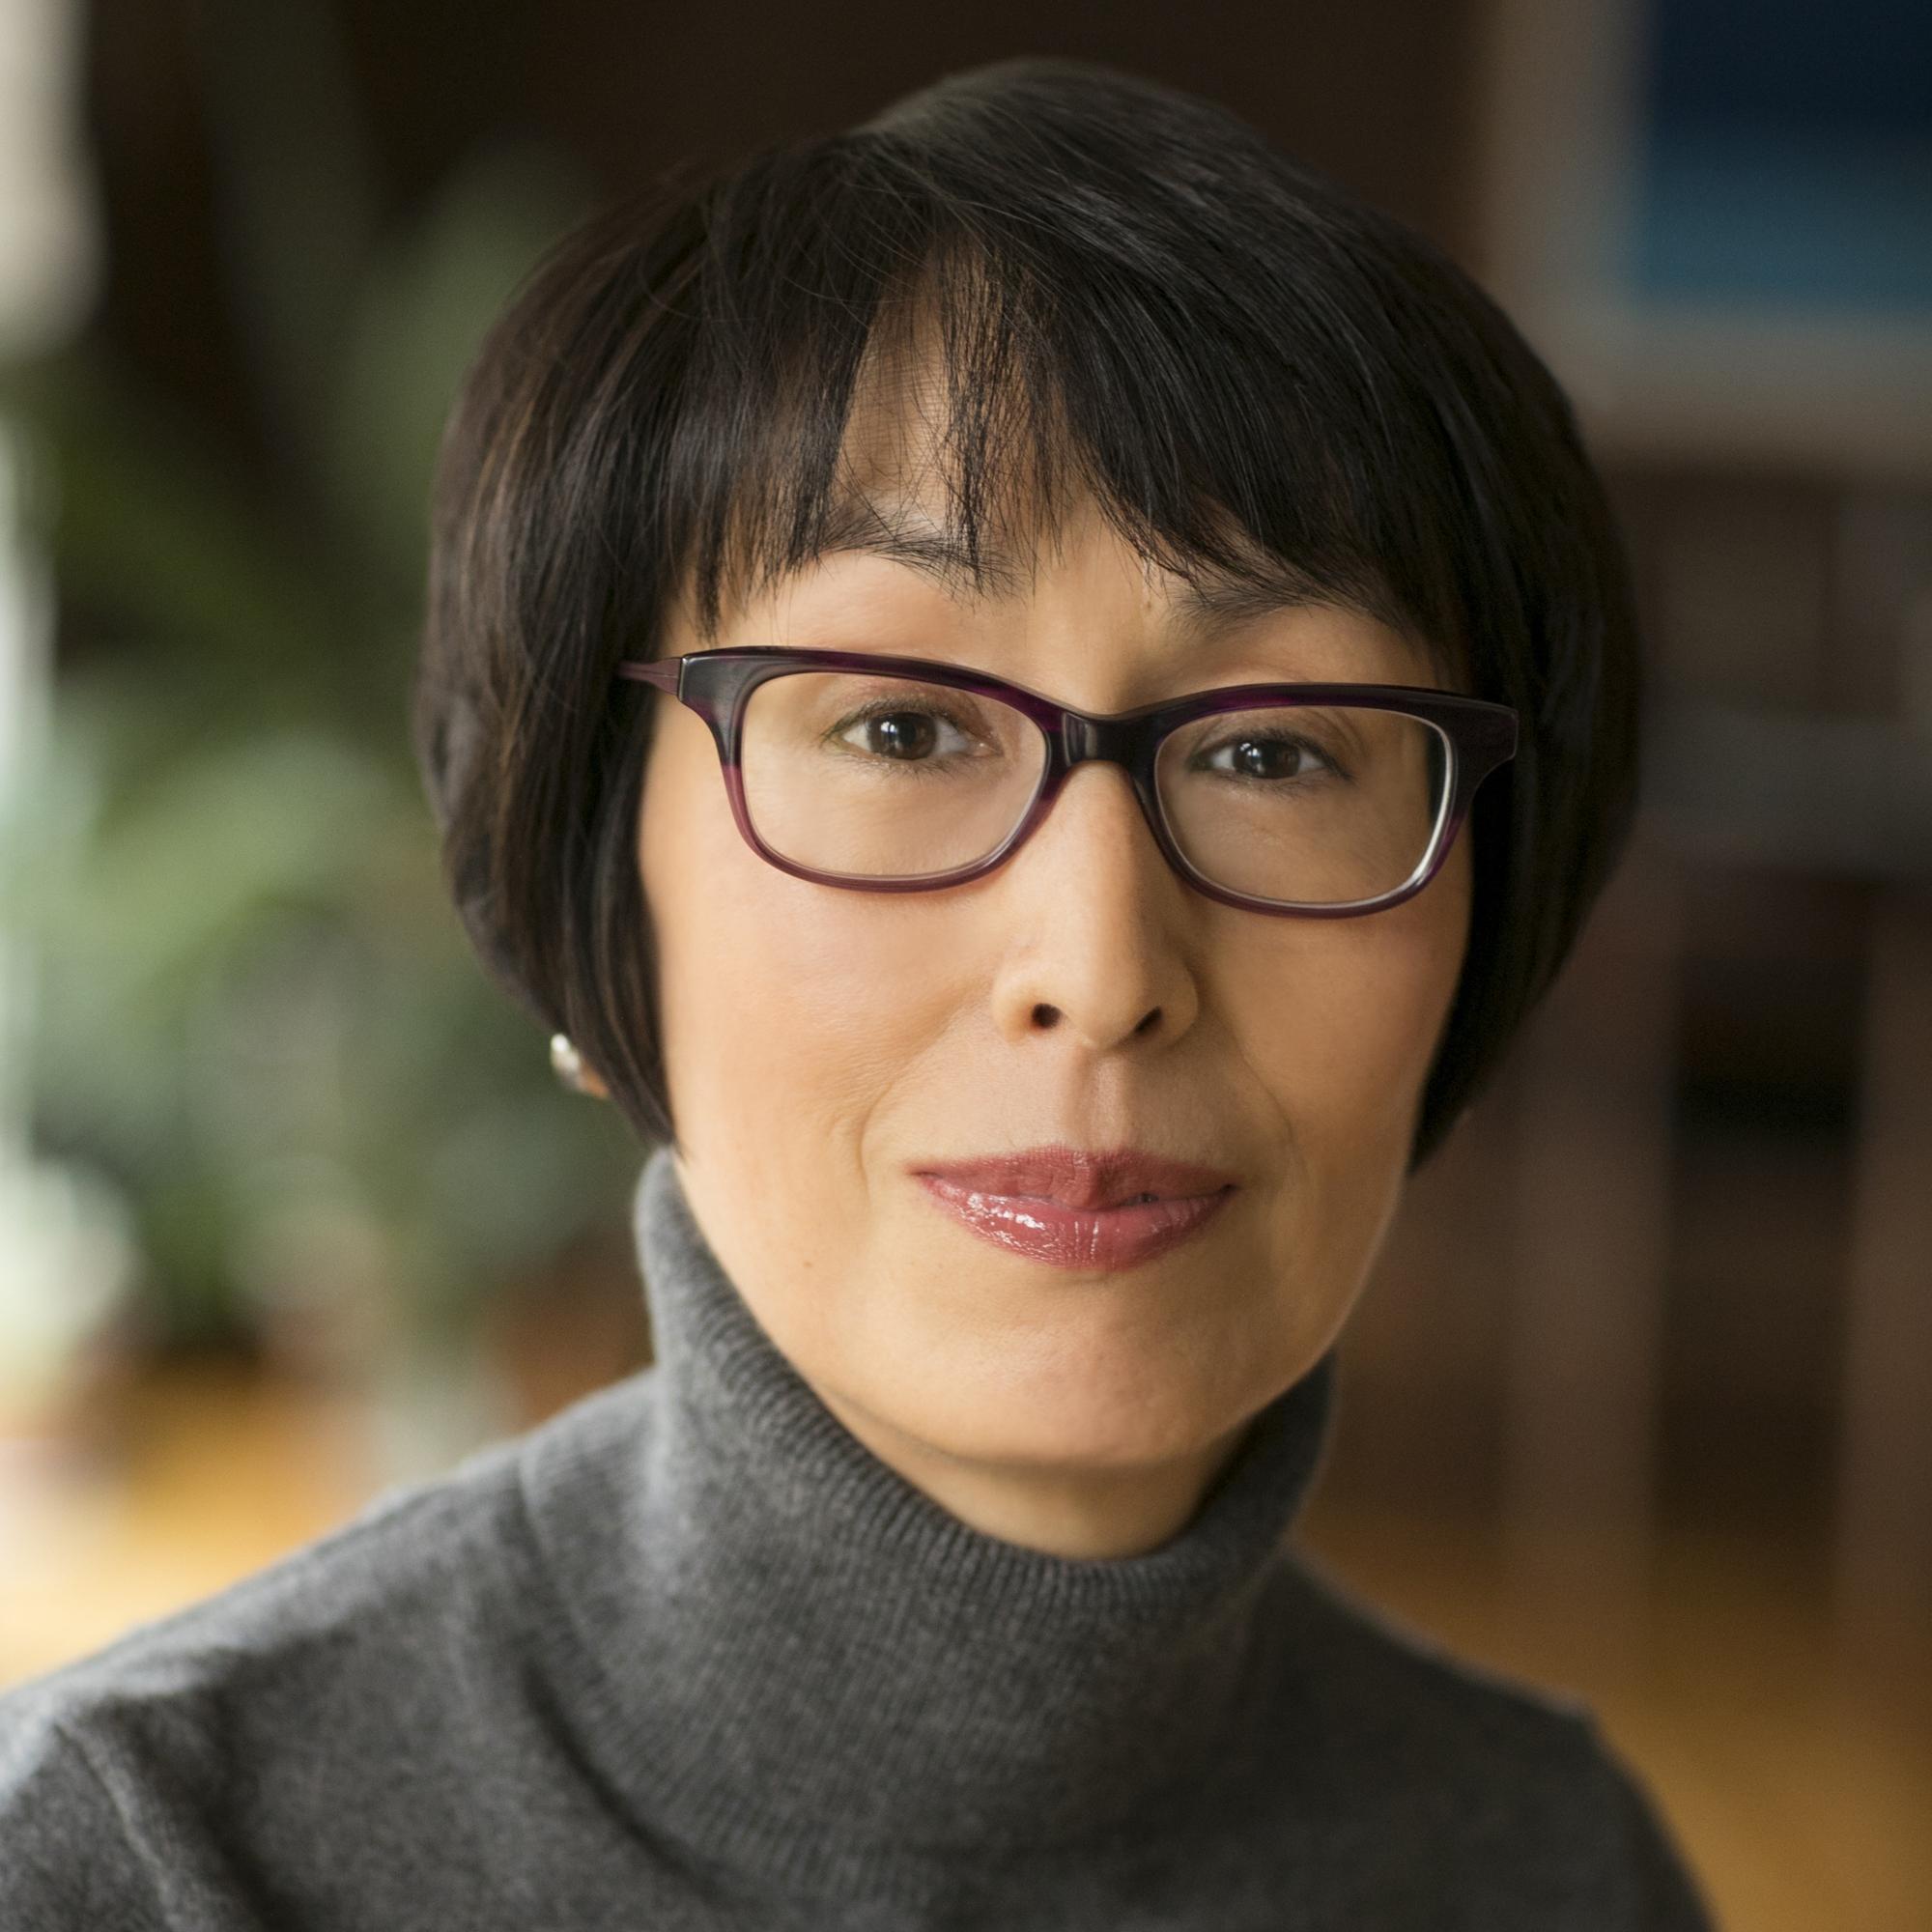 Motoko Aizawa - Finance, Trade, and Investment